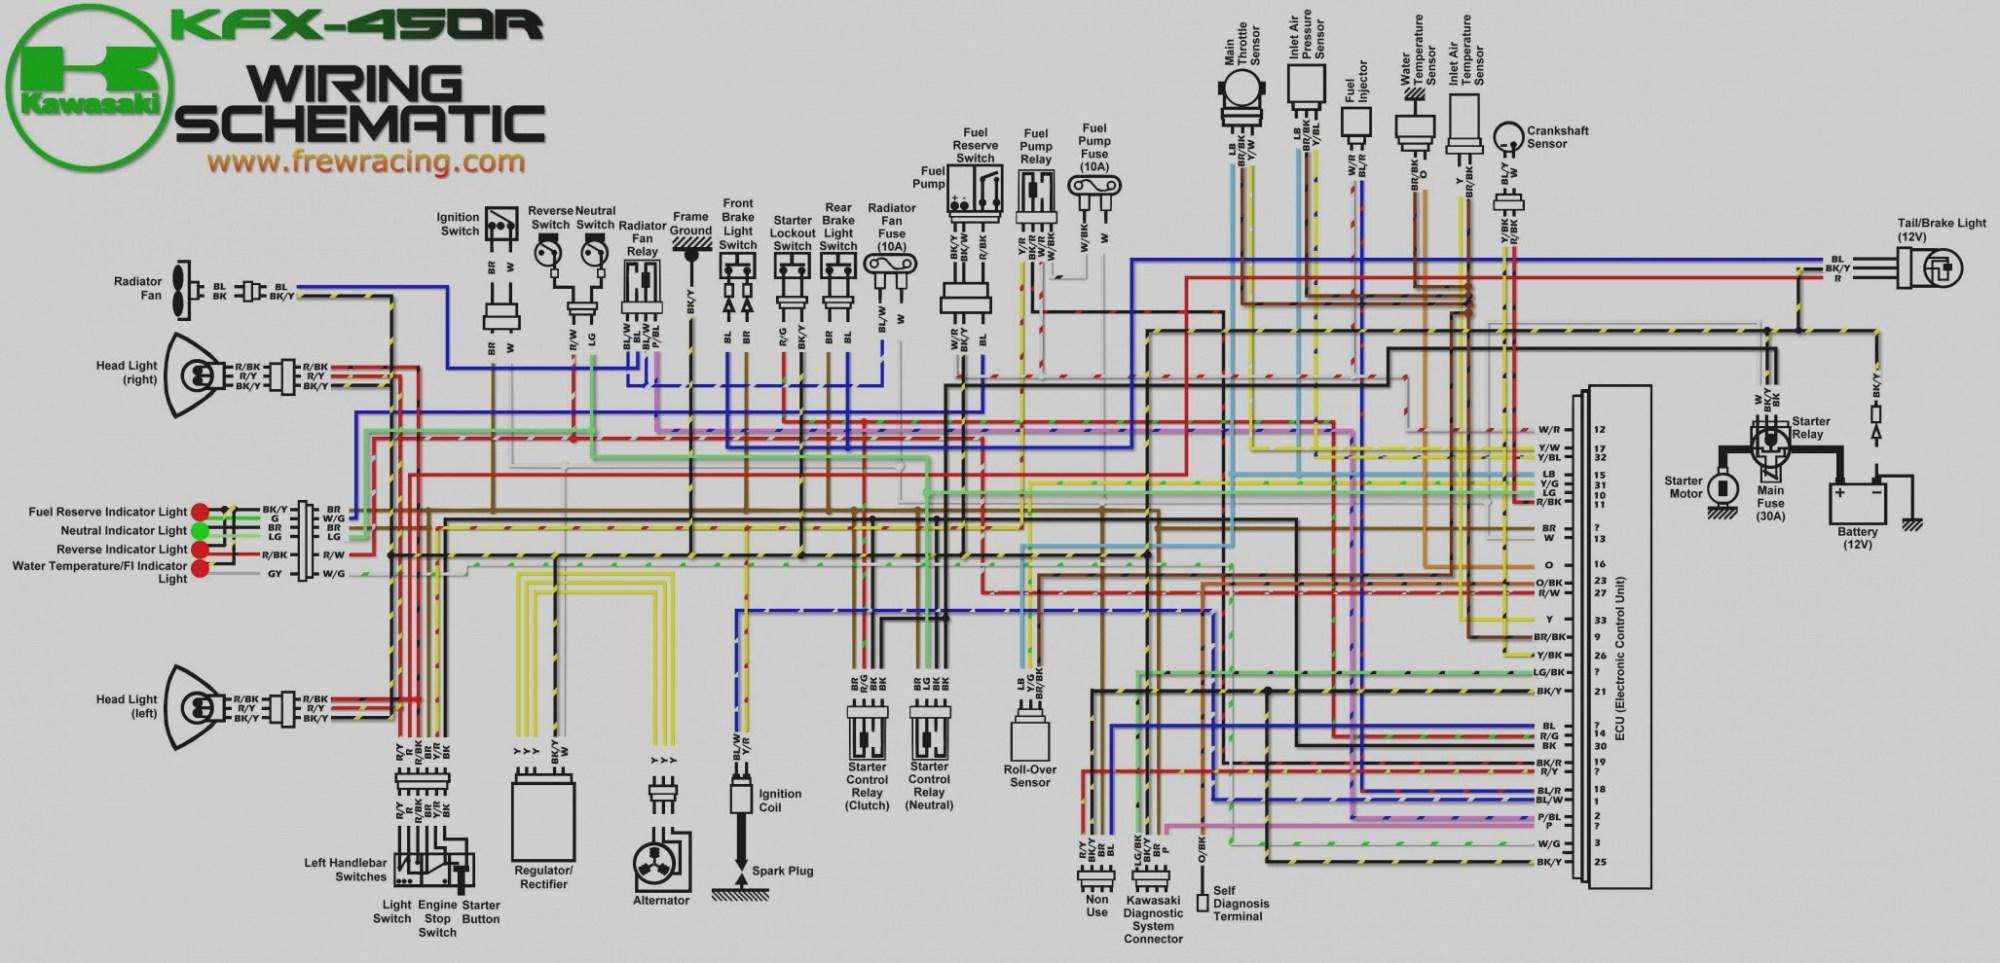 hight resolution of 2005 yamaha yfz 450 wiring diagram wire center u2022 rh ayseesra co